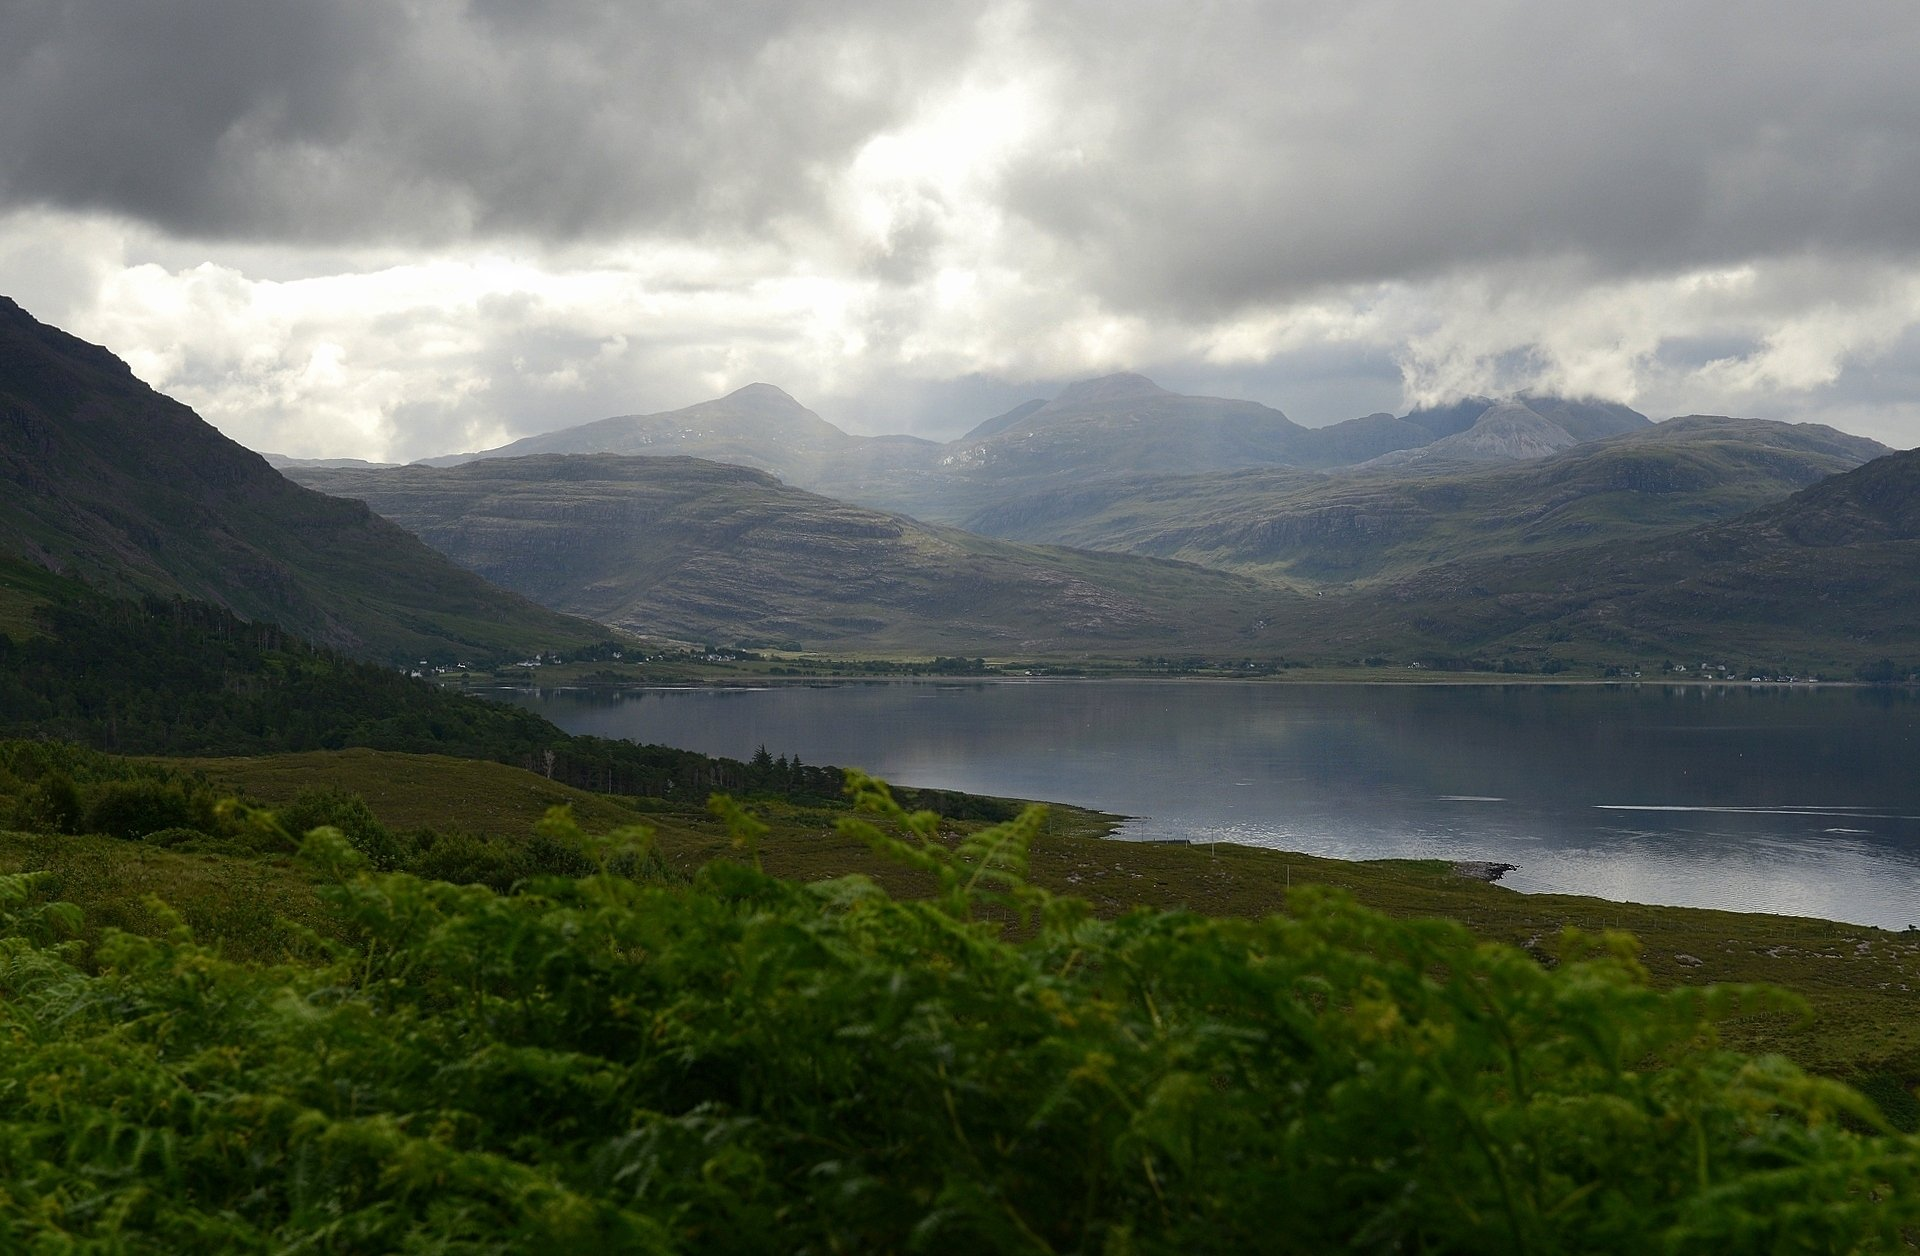 Scozia: le Highlands